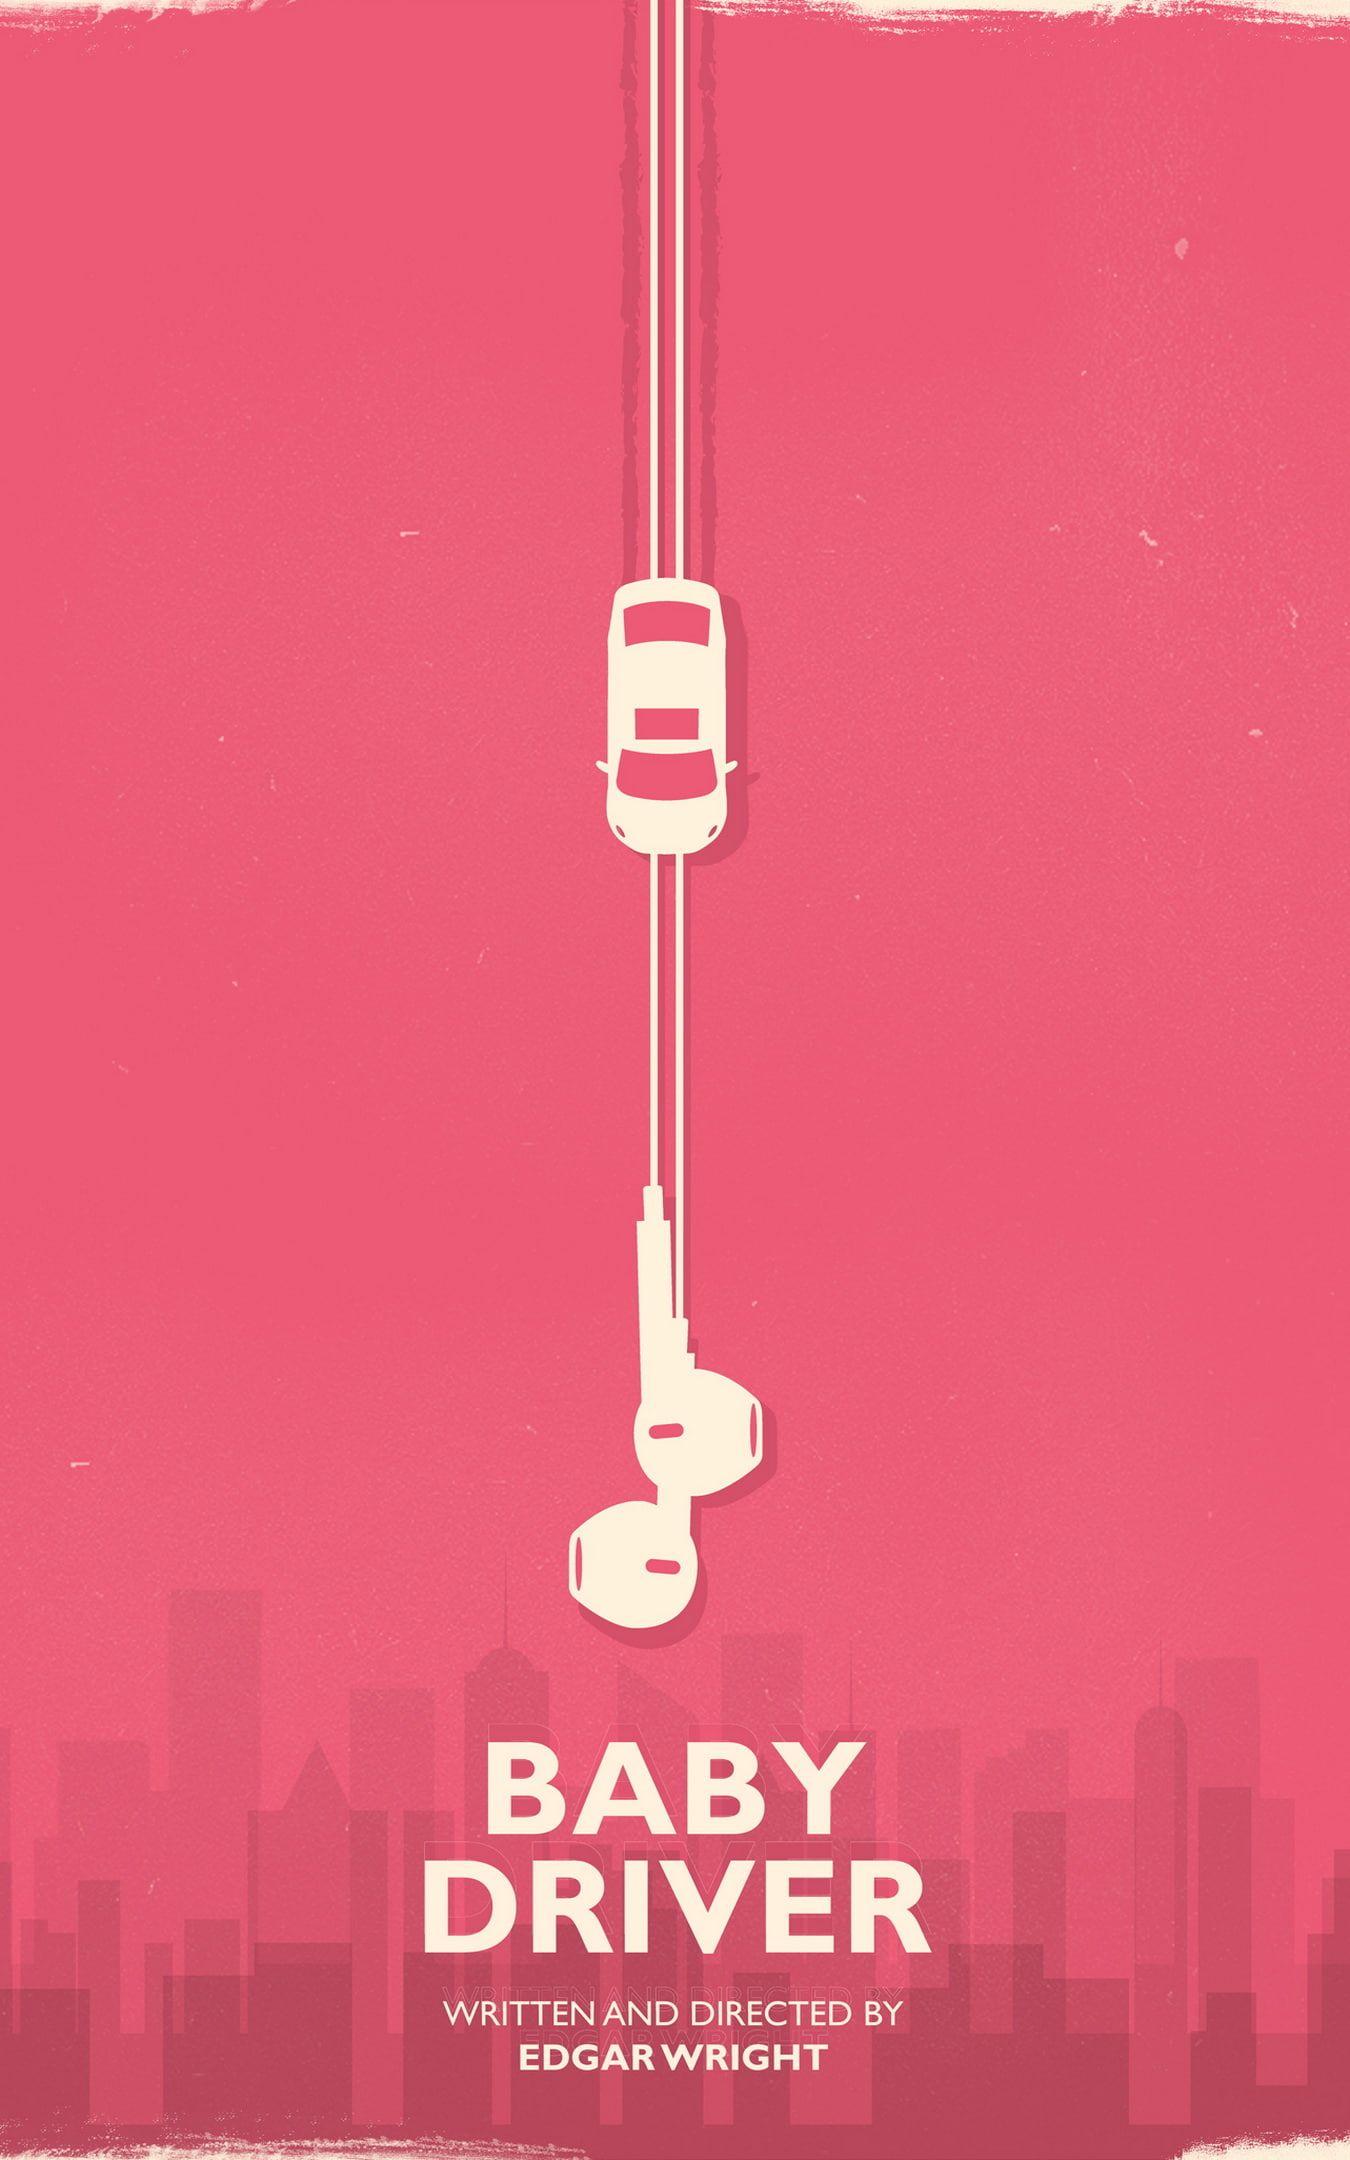 Movies Edgar Wright Baby Driver Minimalism Car 1080p Wallpaper Hdwallpaper Desktop In 2021 Baby Driver Baby Posters Edgar Wright